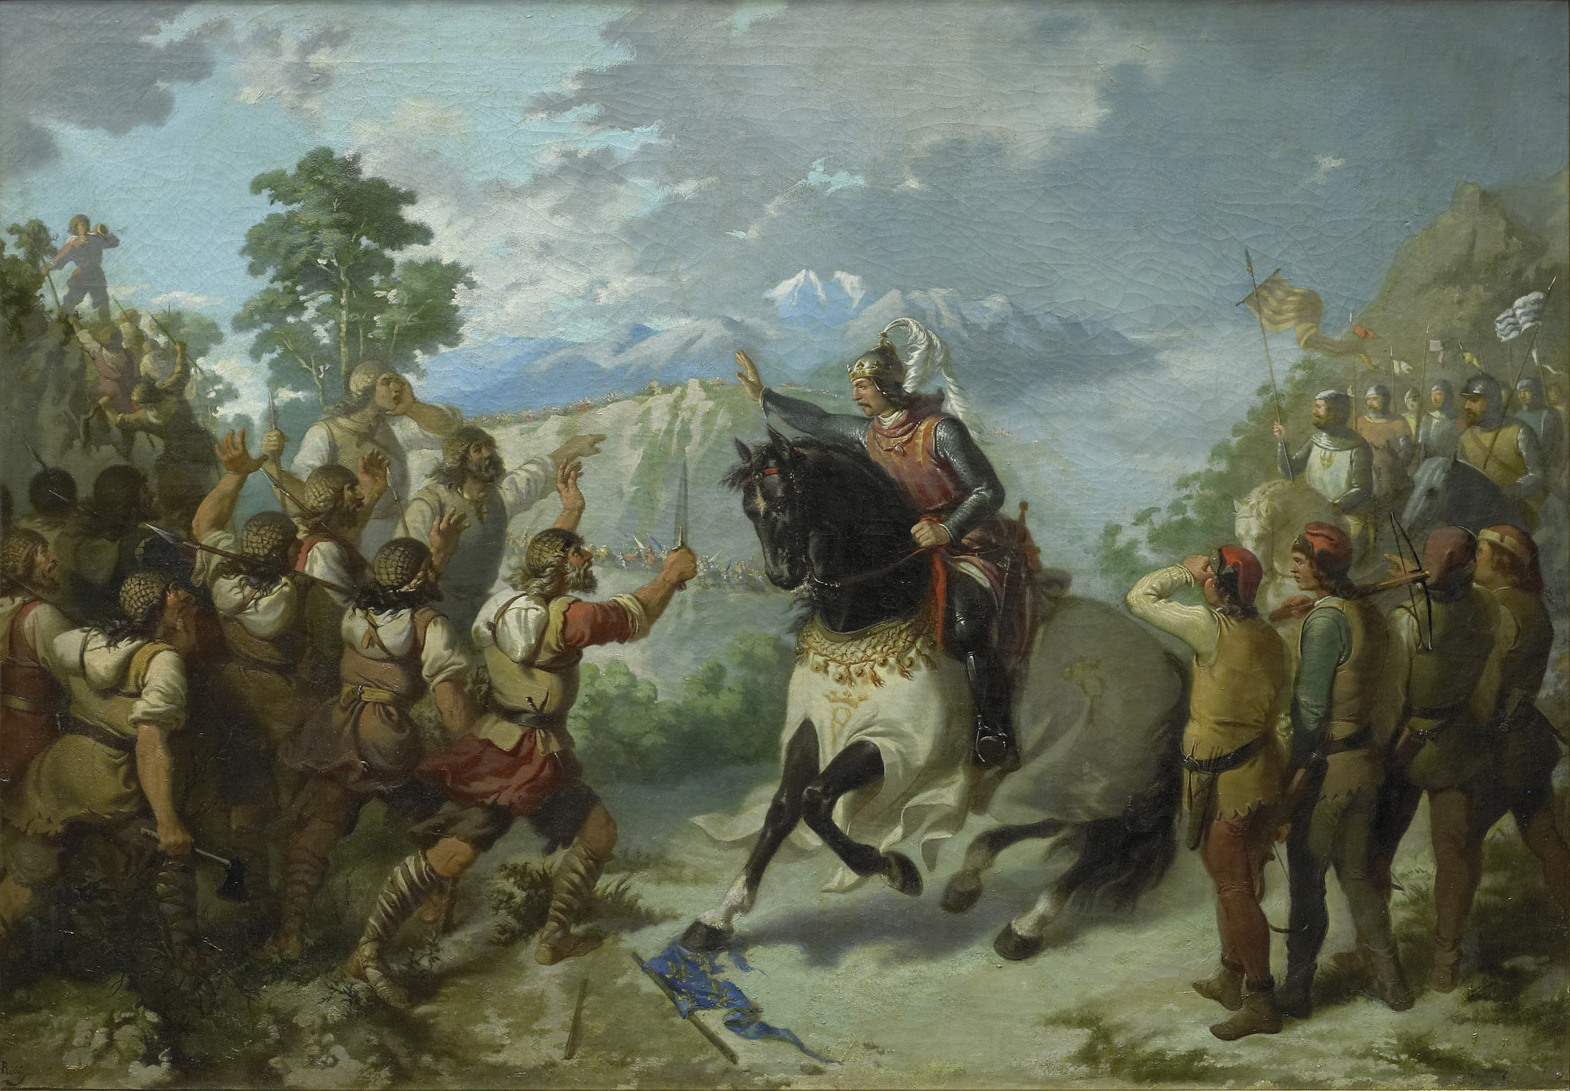 https://upload.wikimedia.org/wikipedia/commons/2/27/Pere_el_Gran_al_Coll_de_Panissars.jpg